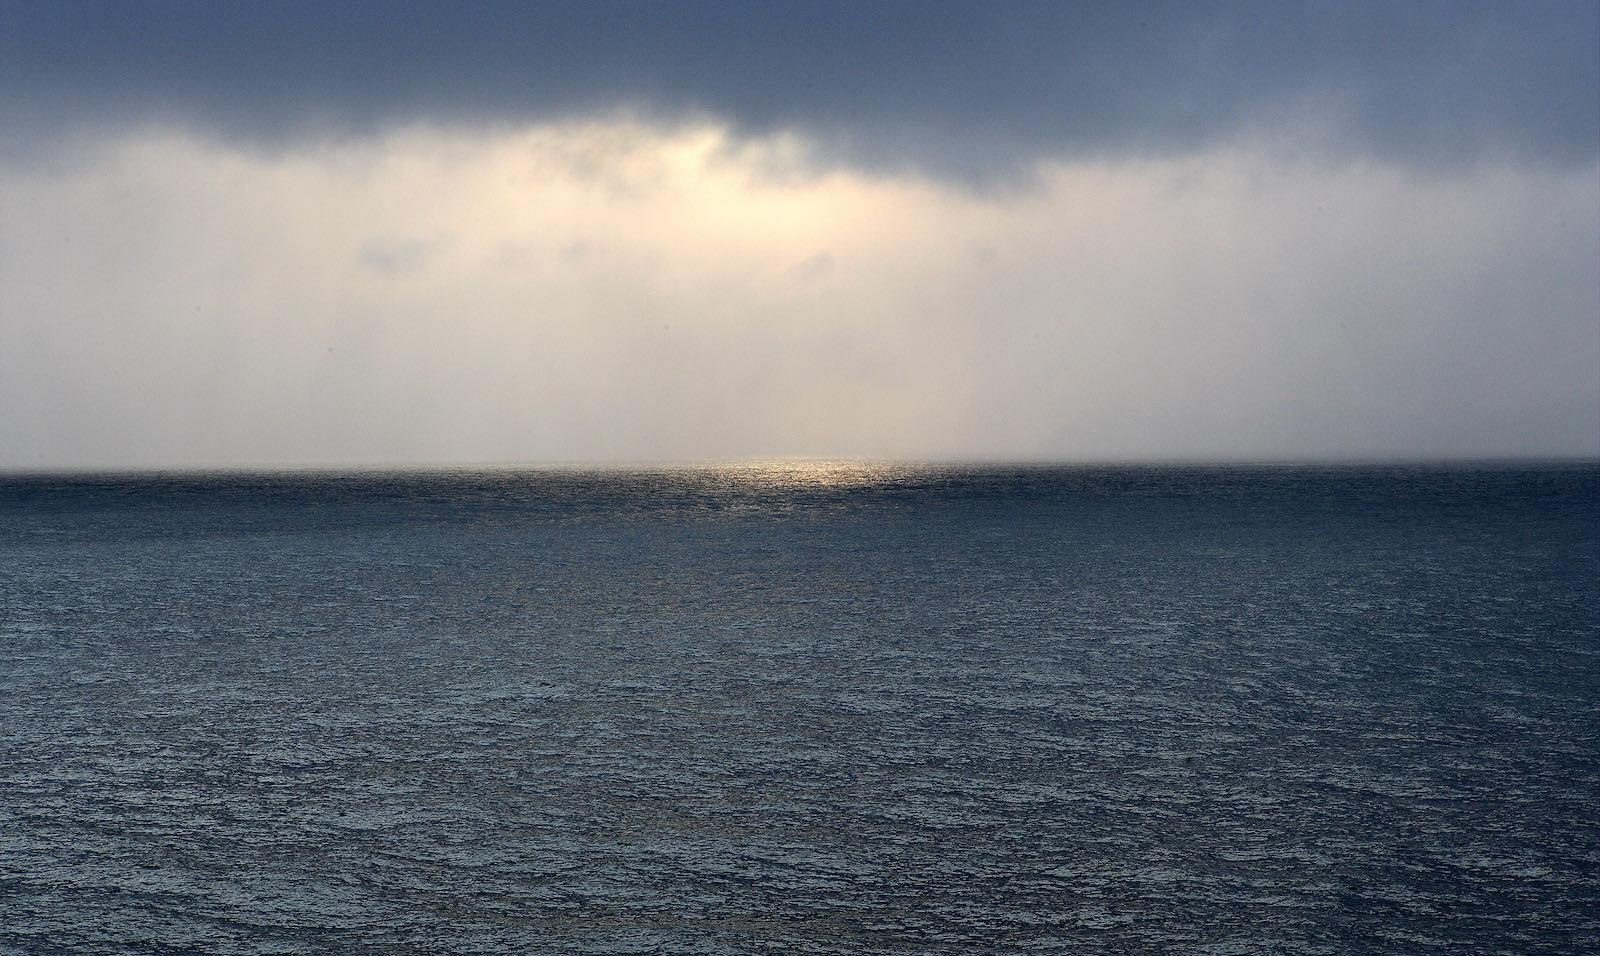 The Barents Sea